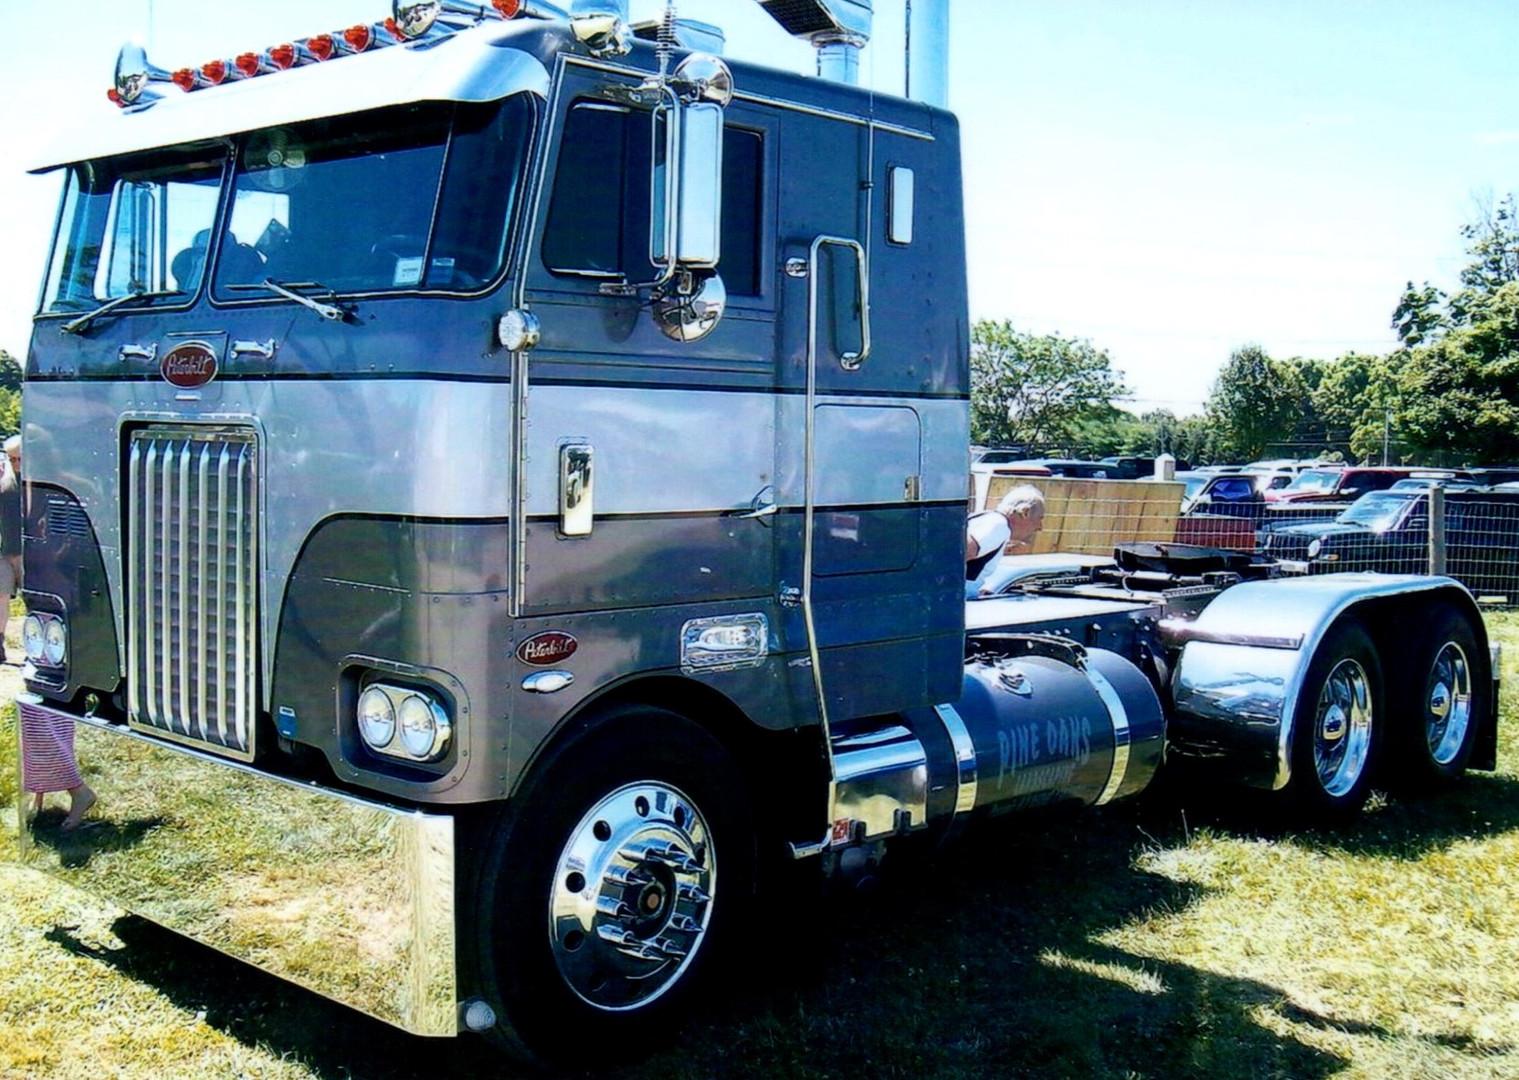 2000 Peterbilt COE tractor - Ken Conroy